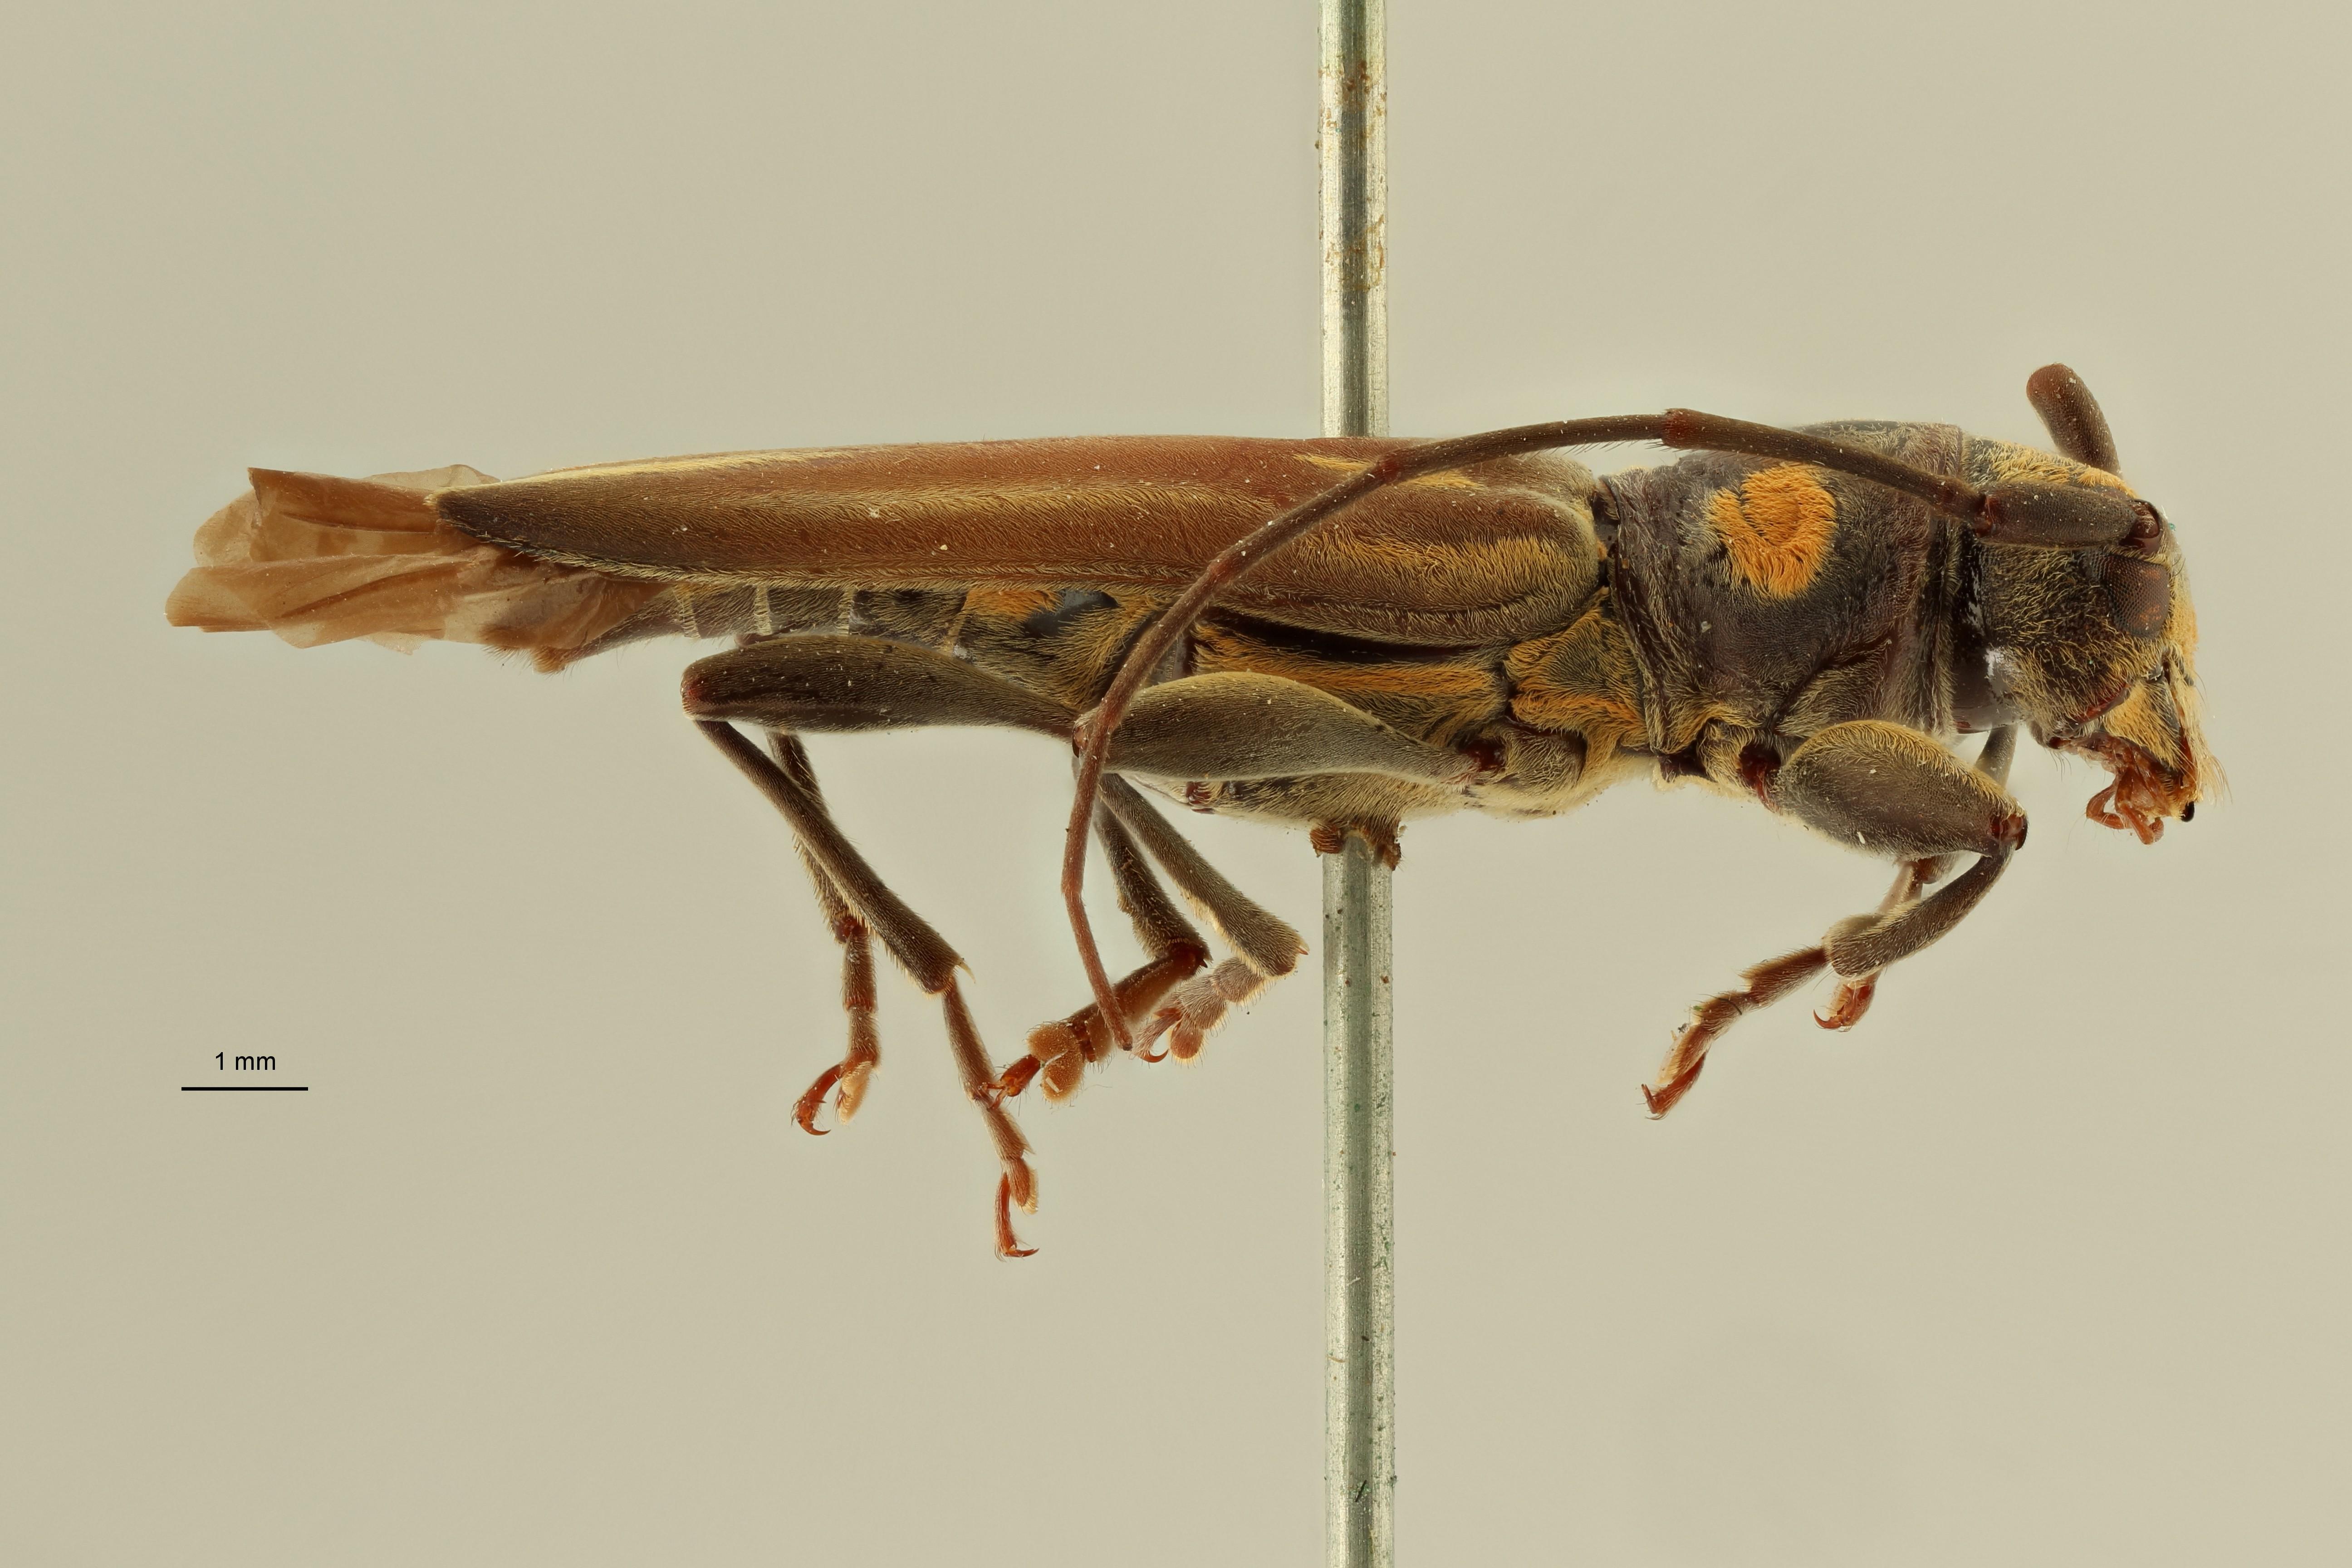 Enicodes bimaculatus st1 L ZS PMax Scaled.jpeg